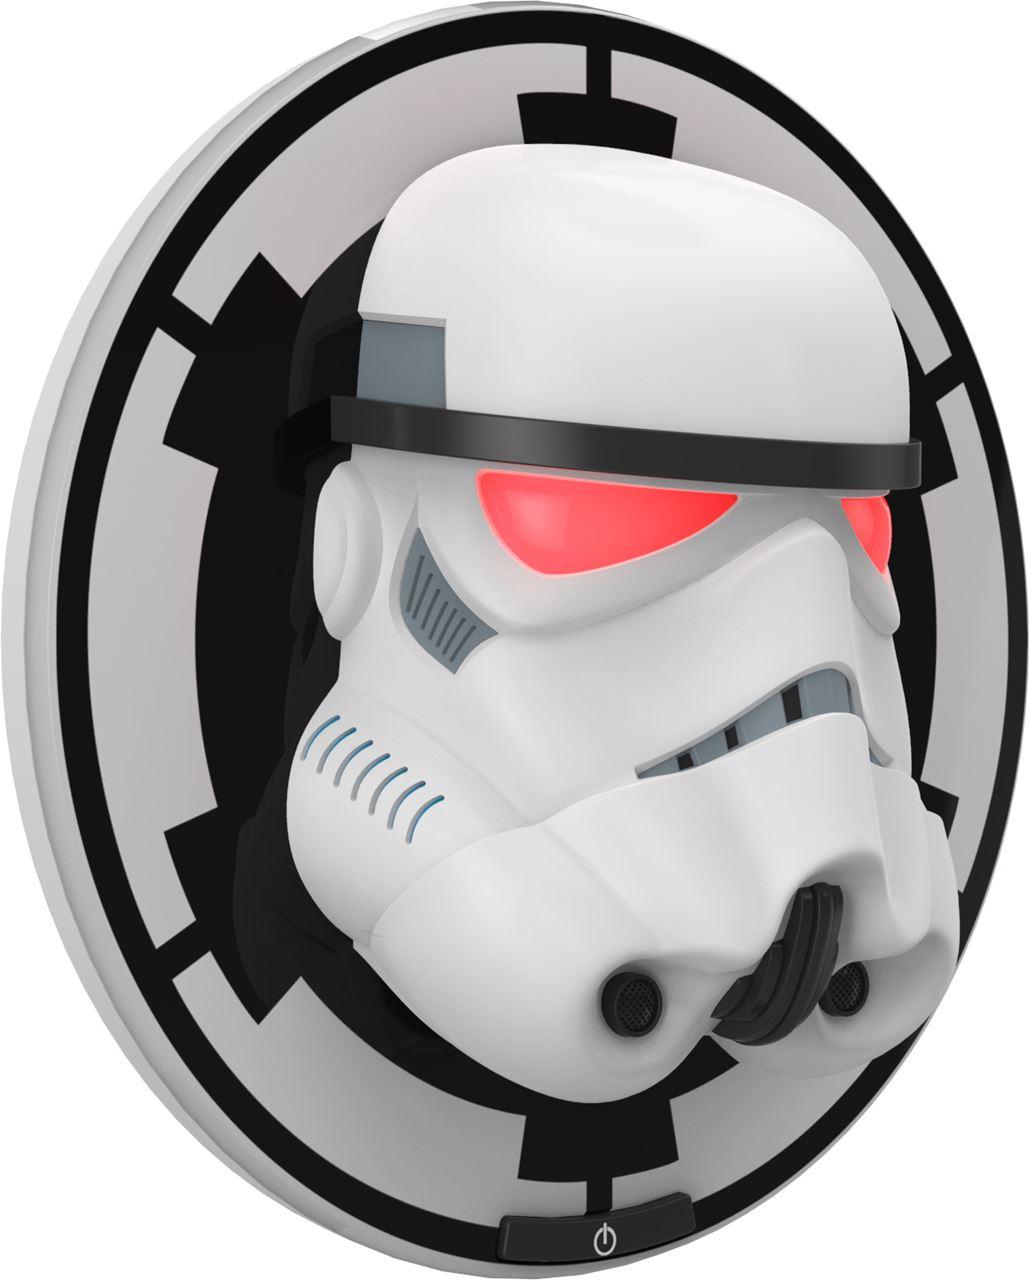 Channeldistribution - Philips 3D LED Wall Light - Star Wars Stormtrooper